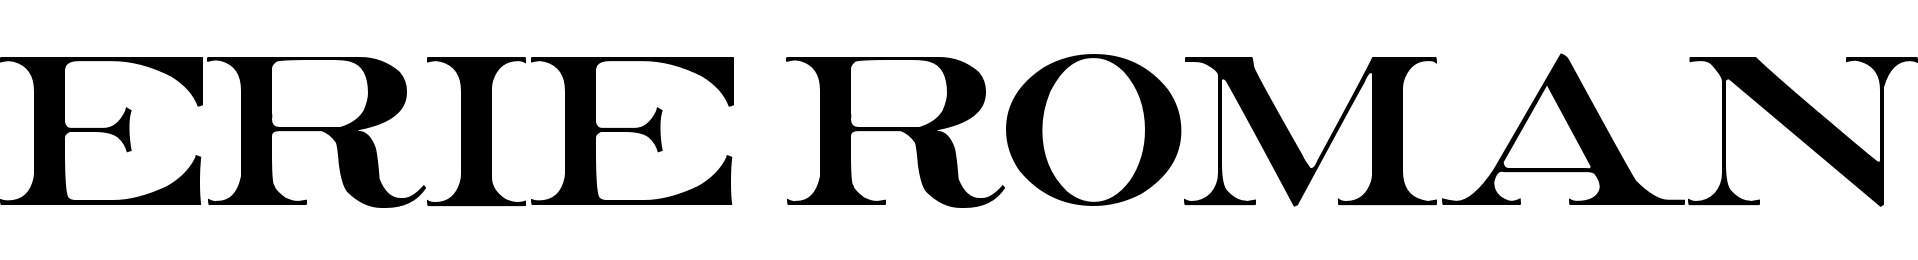 Erie Roman